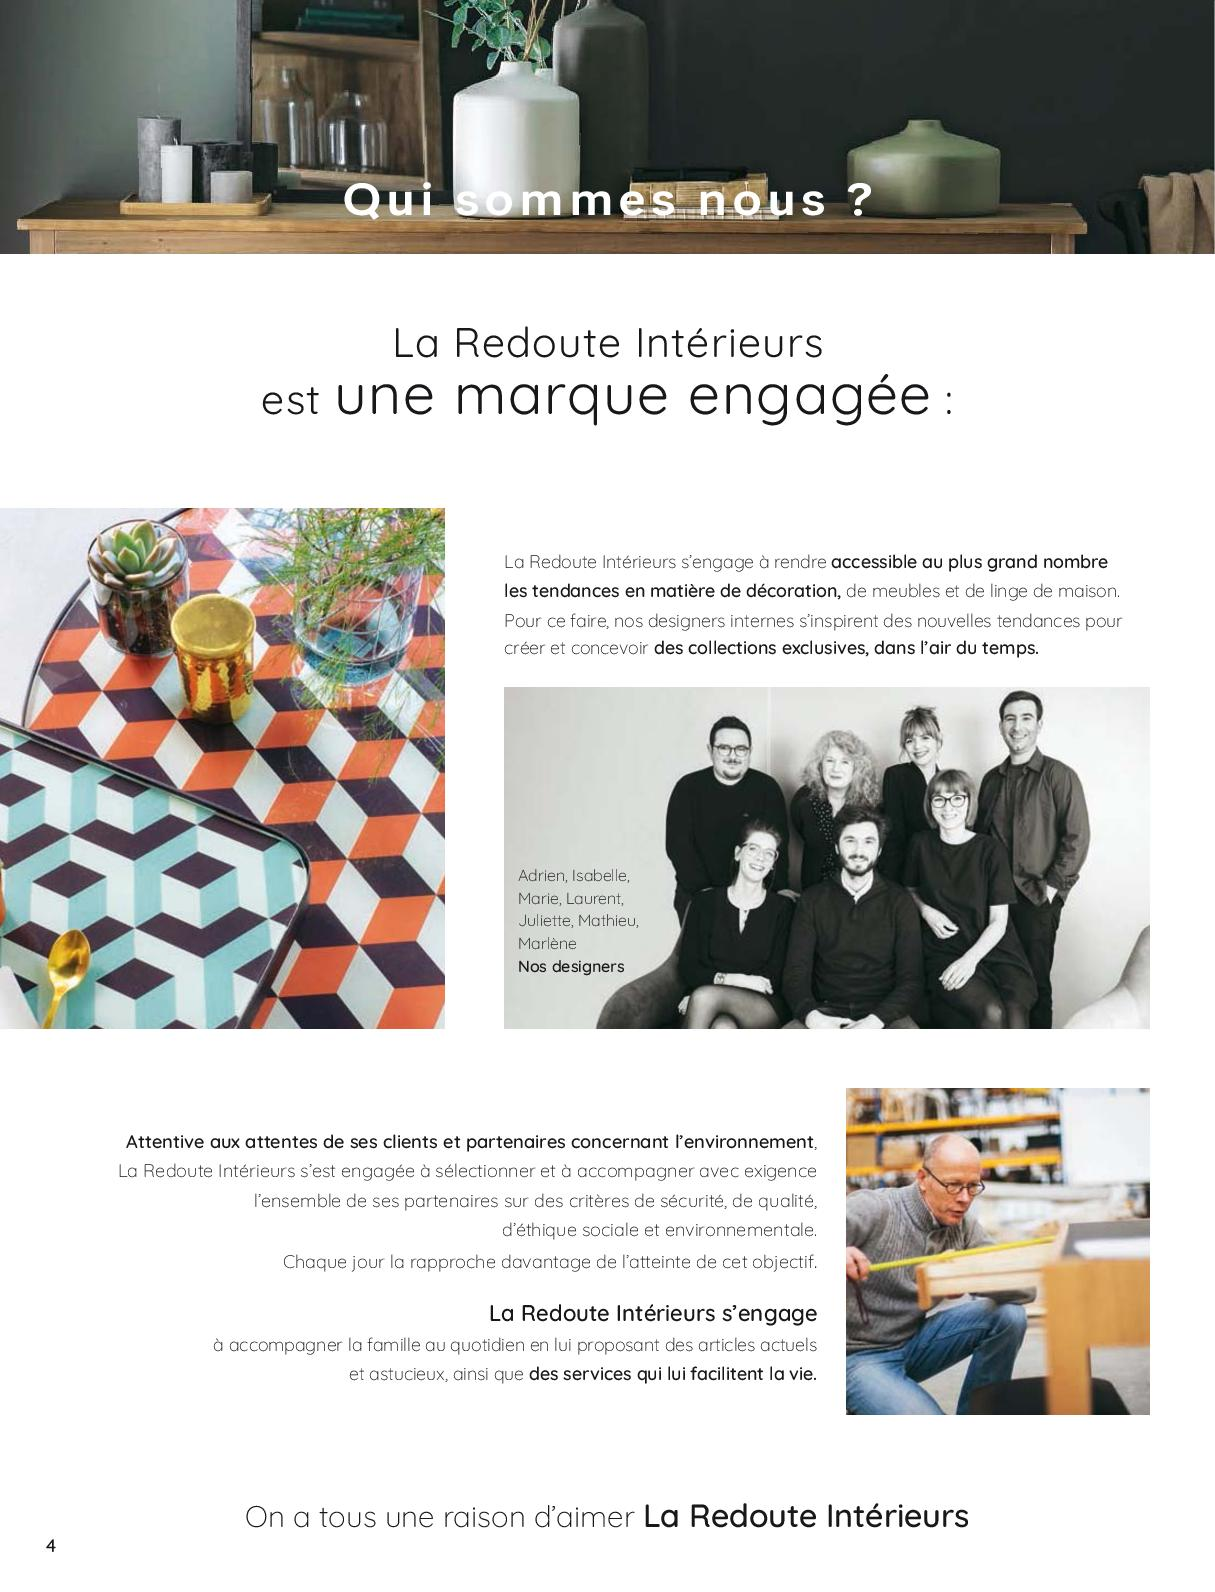 Catalogue La Redoute Interieurs 2018 2019 Calameo Downloader